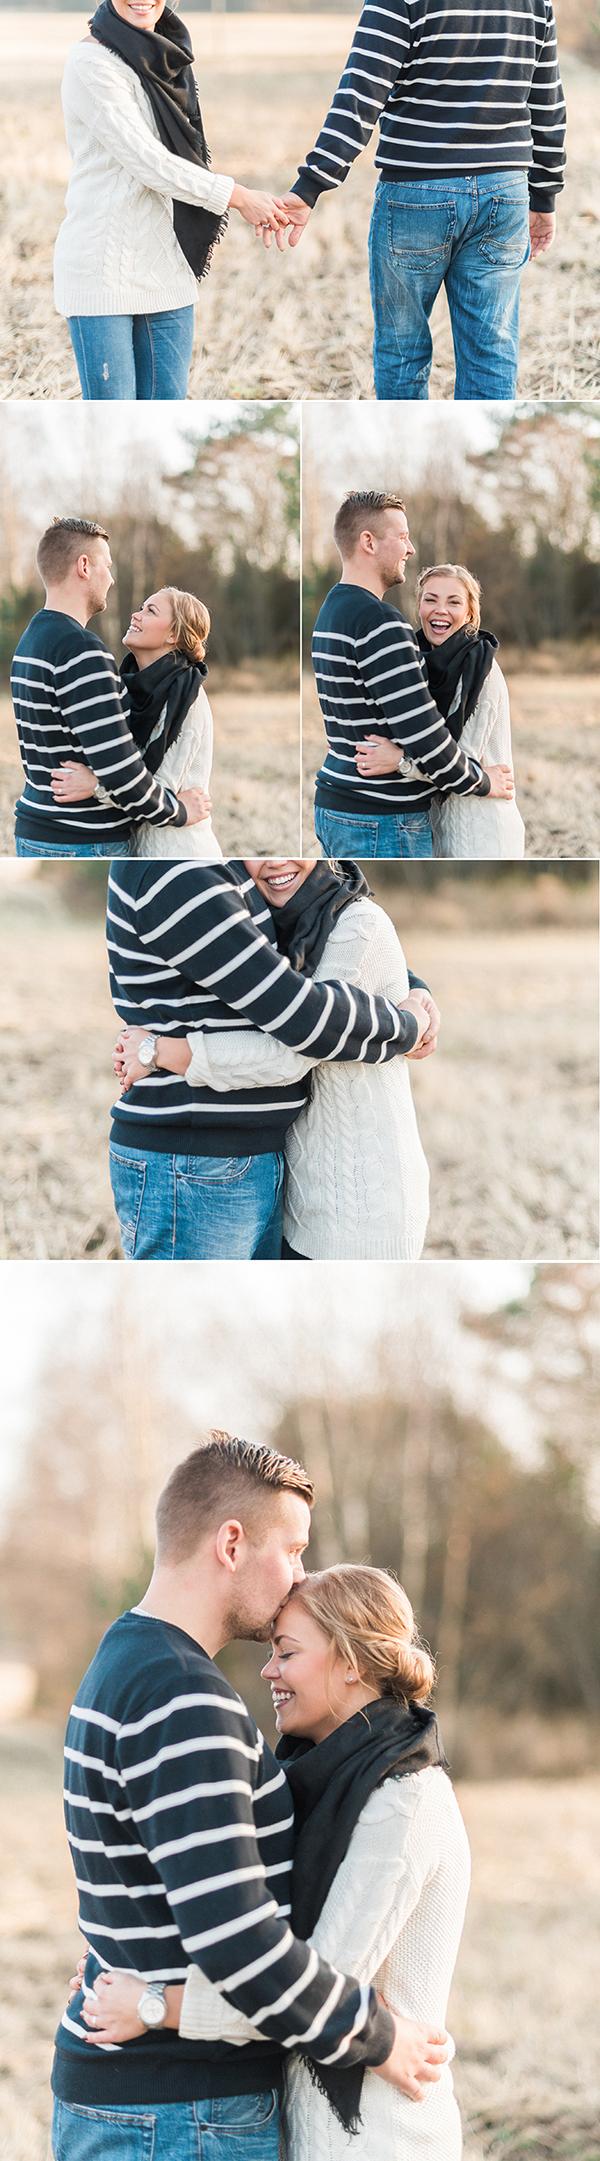 Essi&Ersi,couple shoot, Rauma, Susanna Nordvall Photography (6).jpg